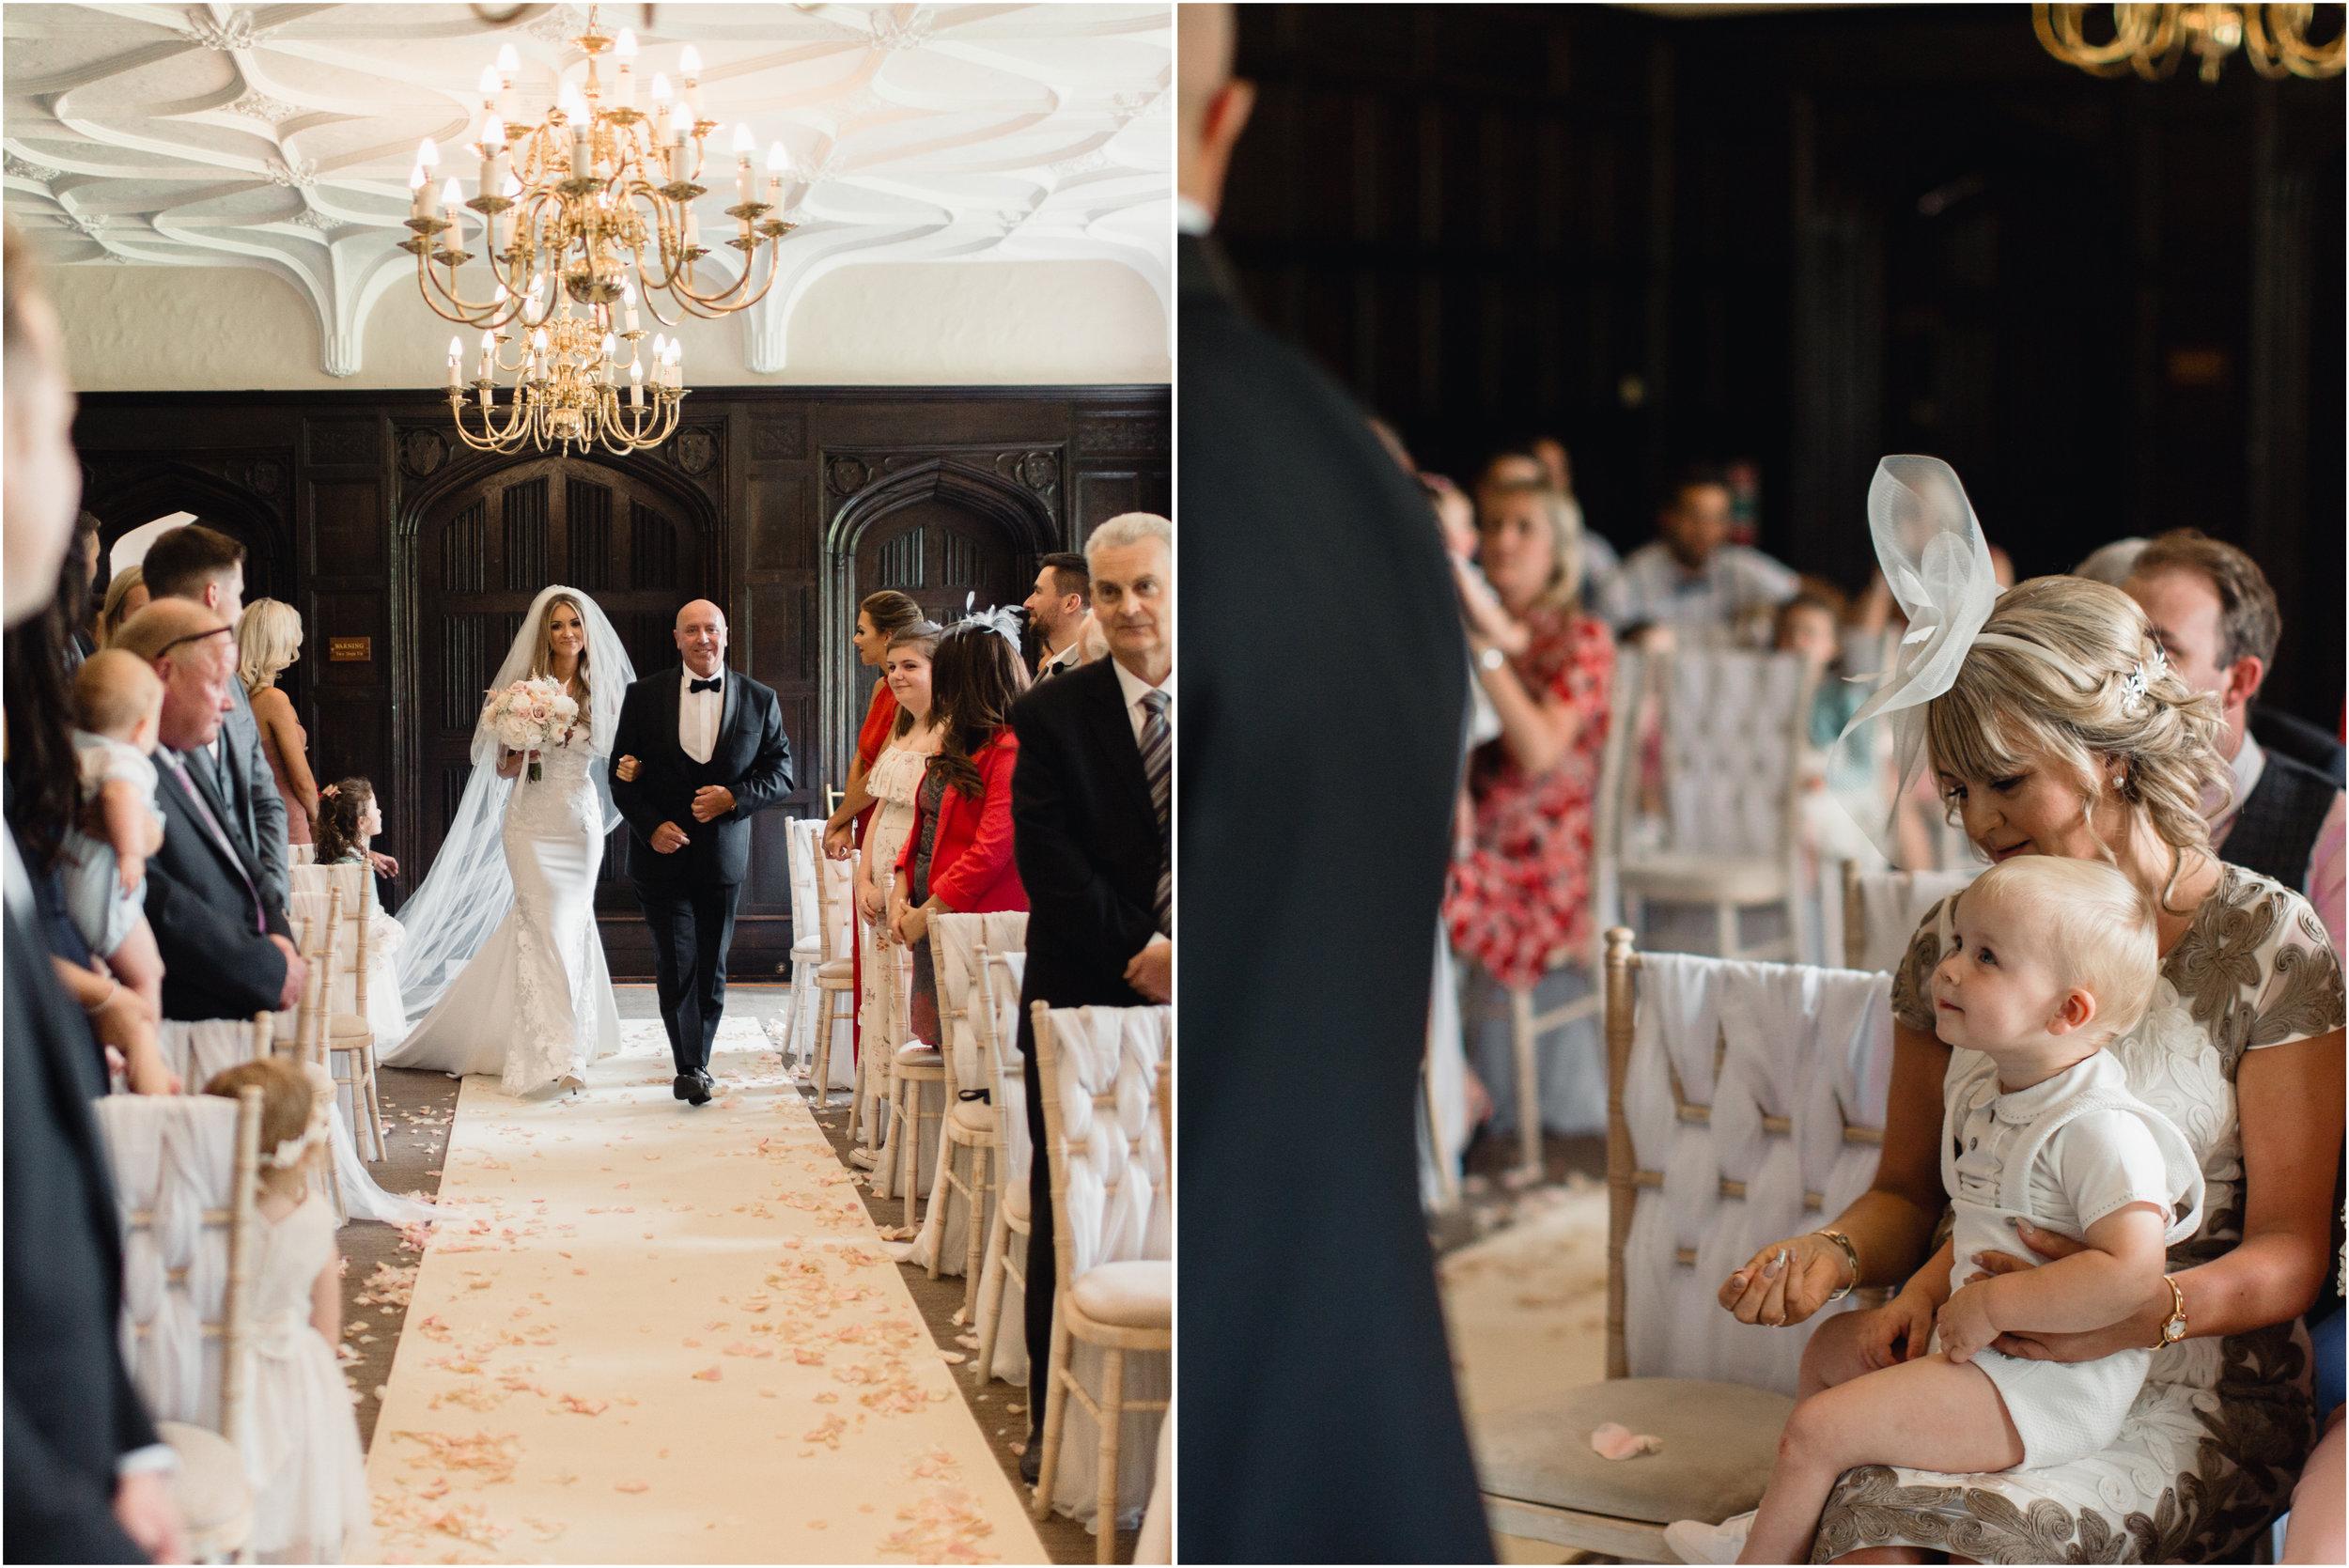 Rebecca Searle Wedding Photography Surrey London Luxury 38.jpg